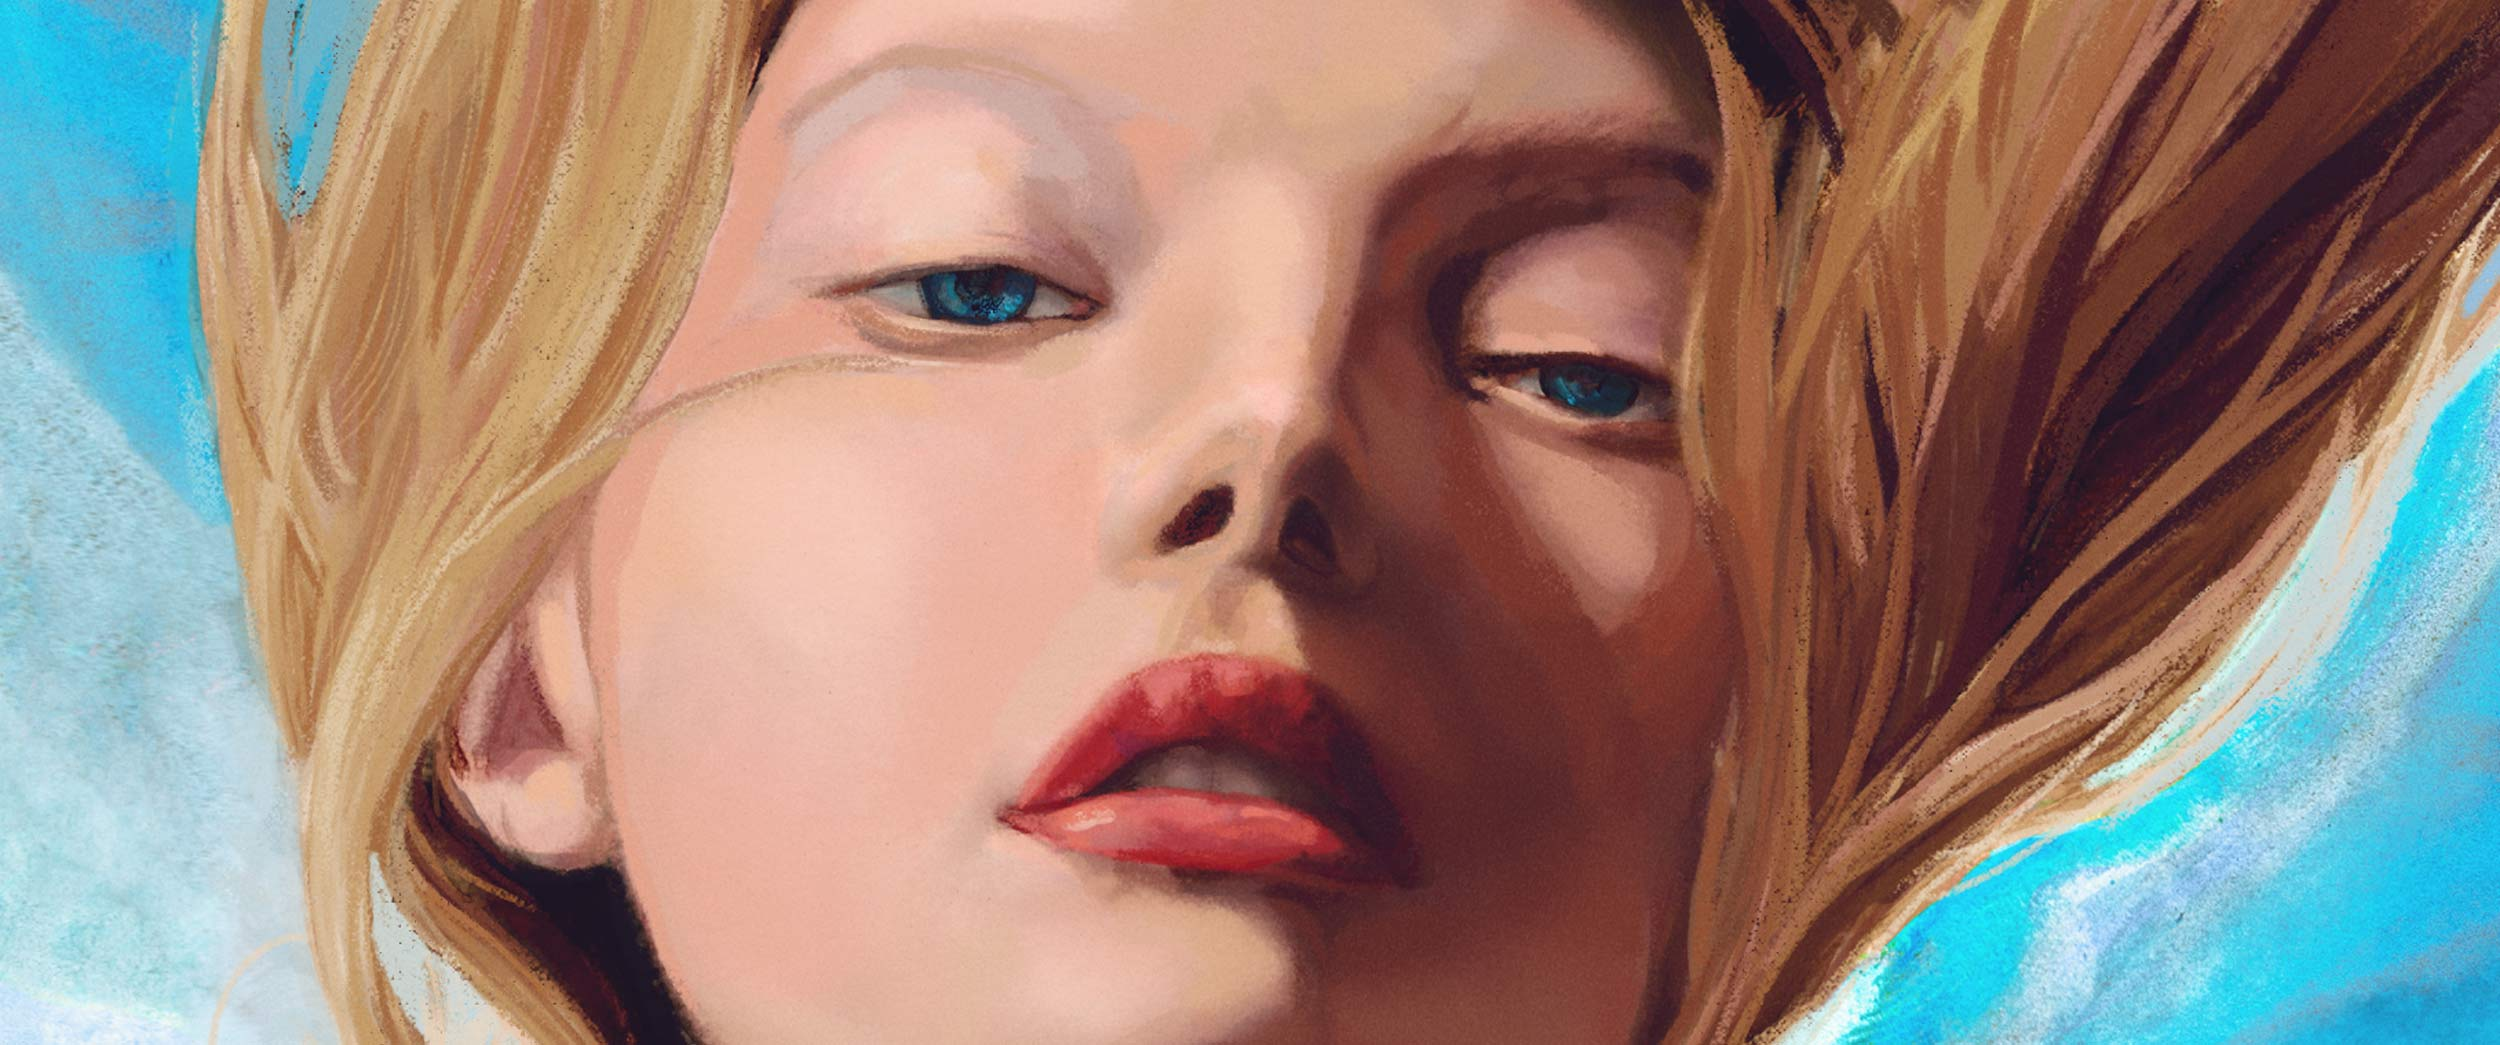 Close up Artist Danny Roberts Painting of Gemma Ward wearing benenciaga based on photo by nick knight